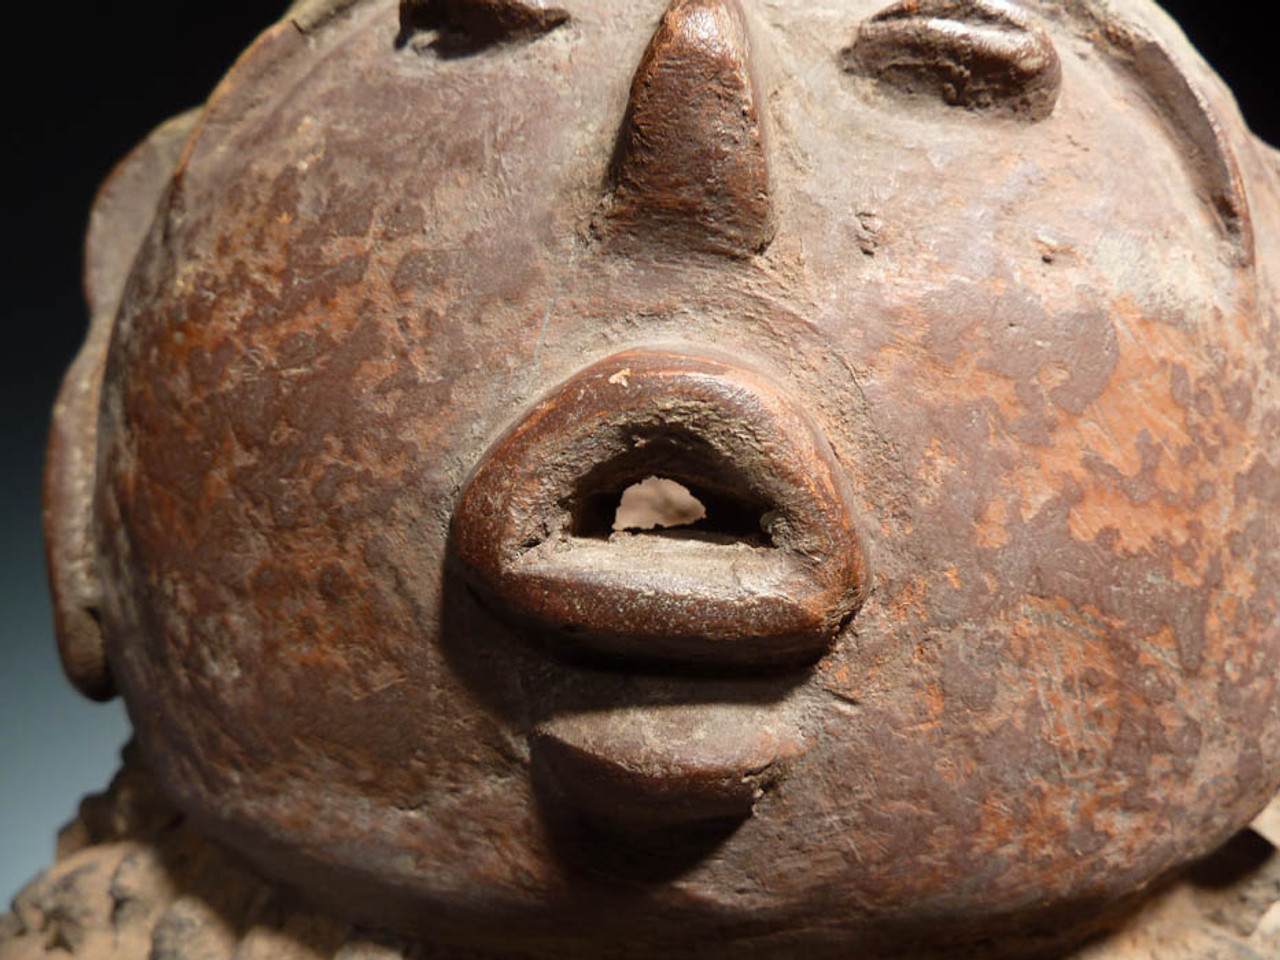 AF001 - RARE GIANT INTACT 30 INCH SACRED AFRICAN LOBI TRIBAL HUMAN SHRINE VESSEL